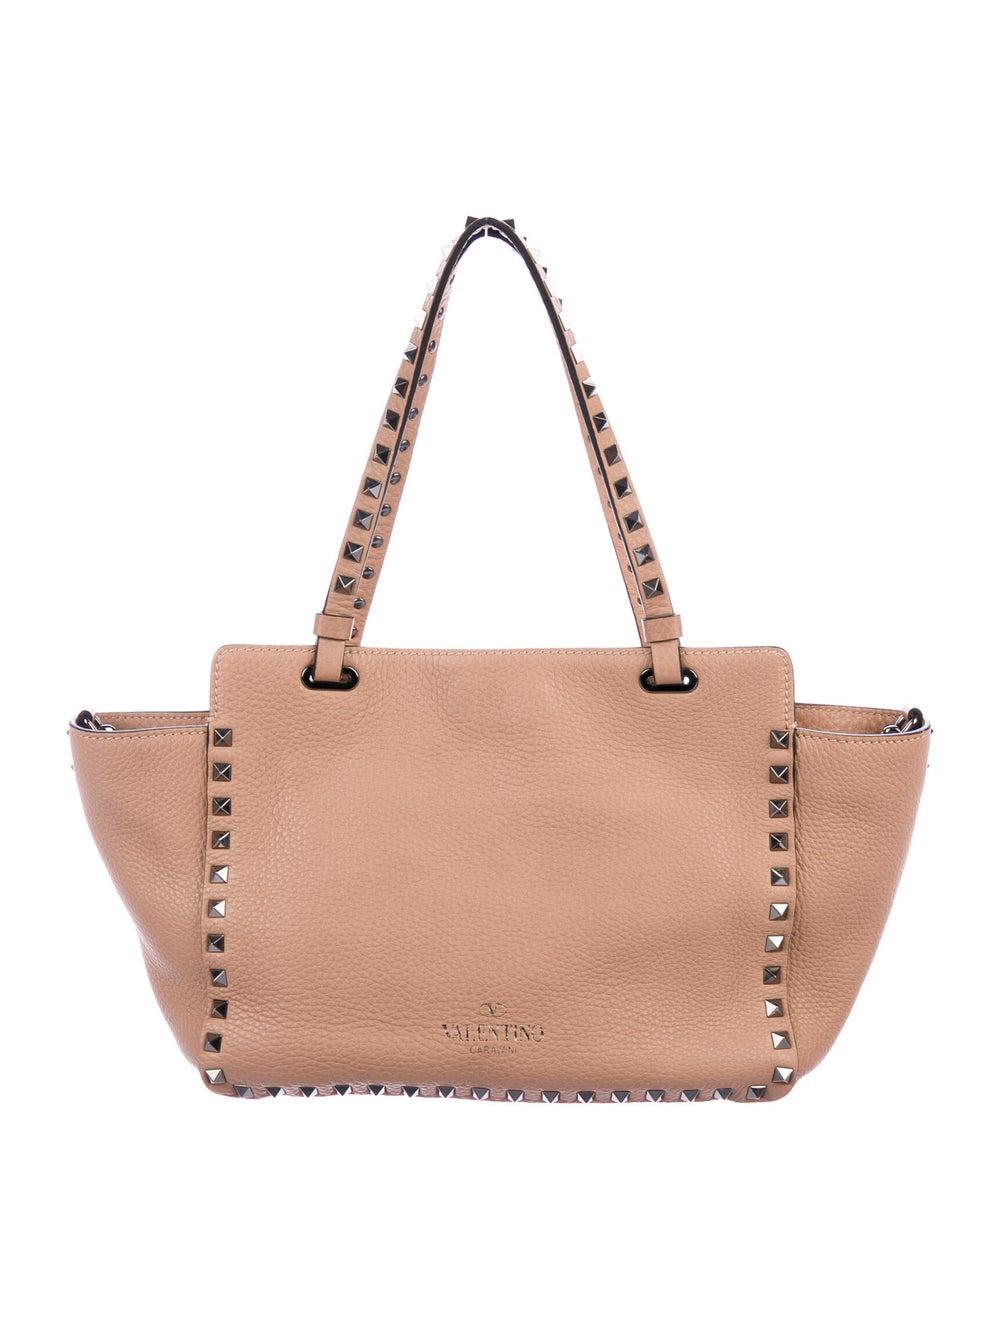 Valentino Leather Rockstud Tote Pink - image 4